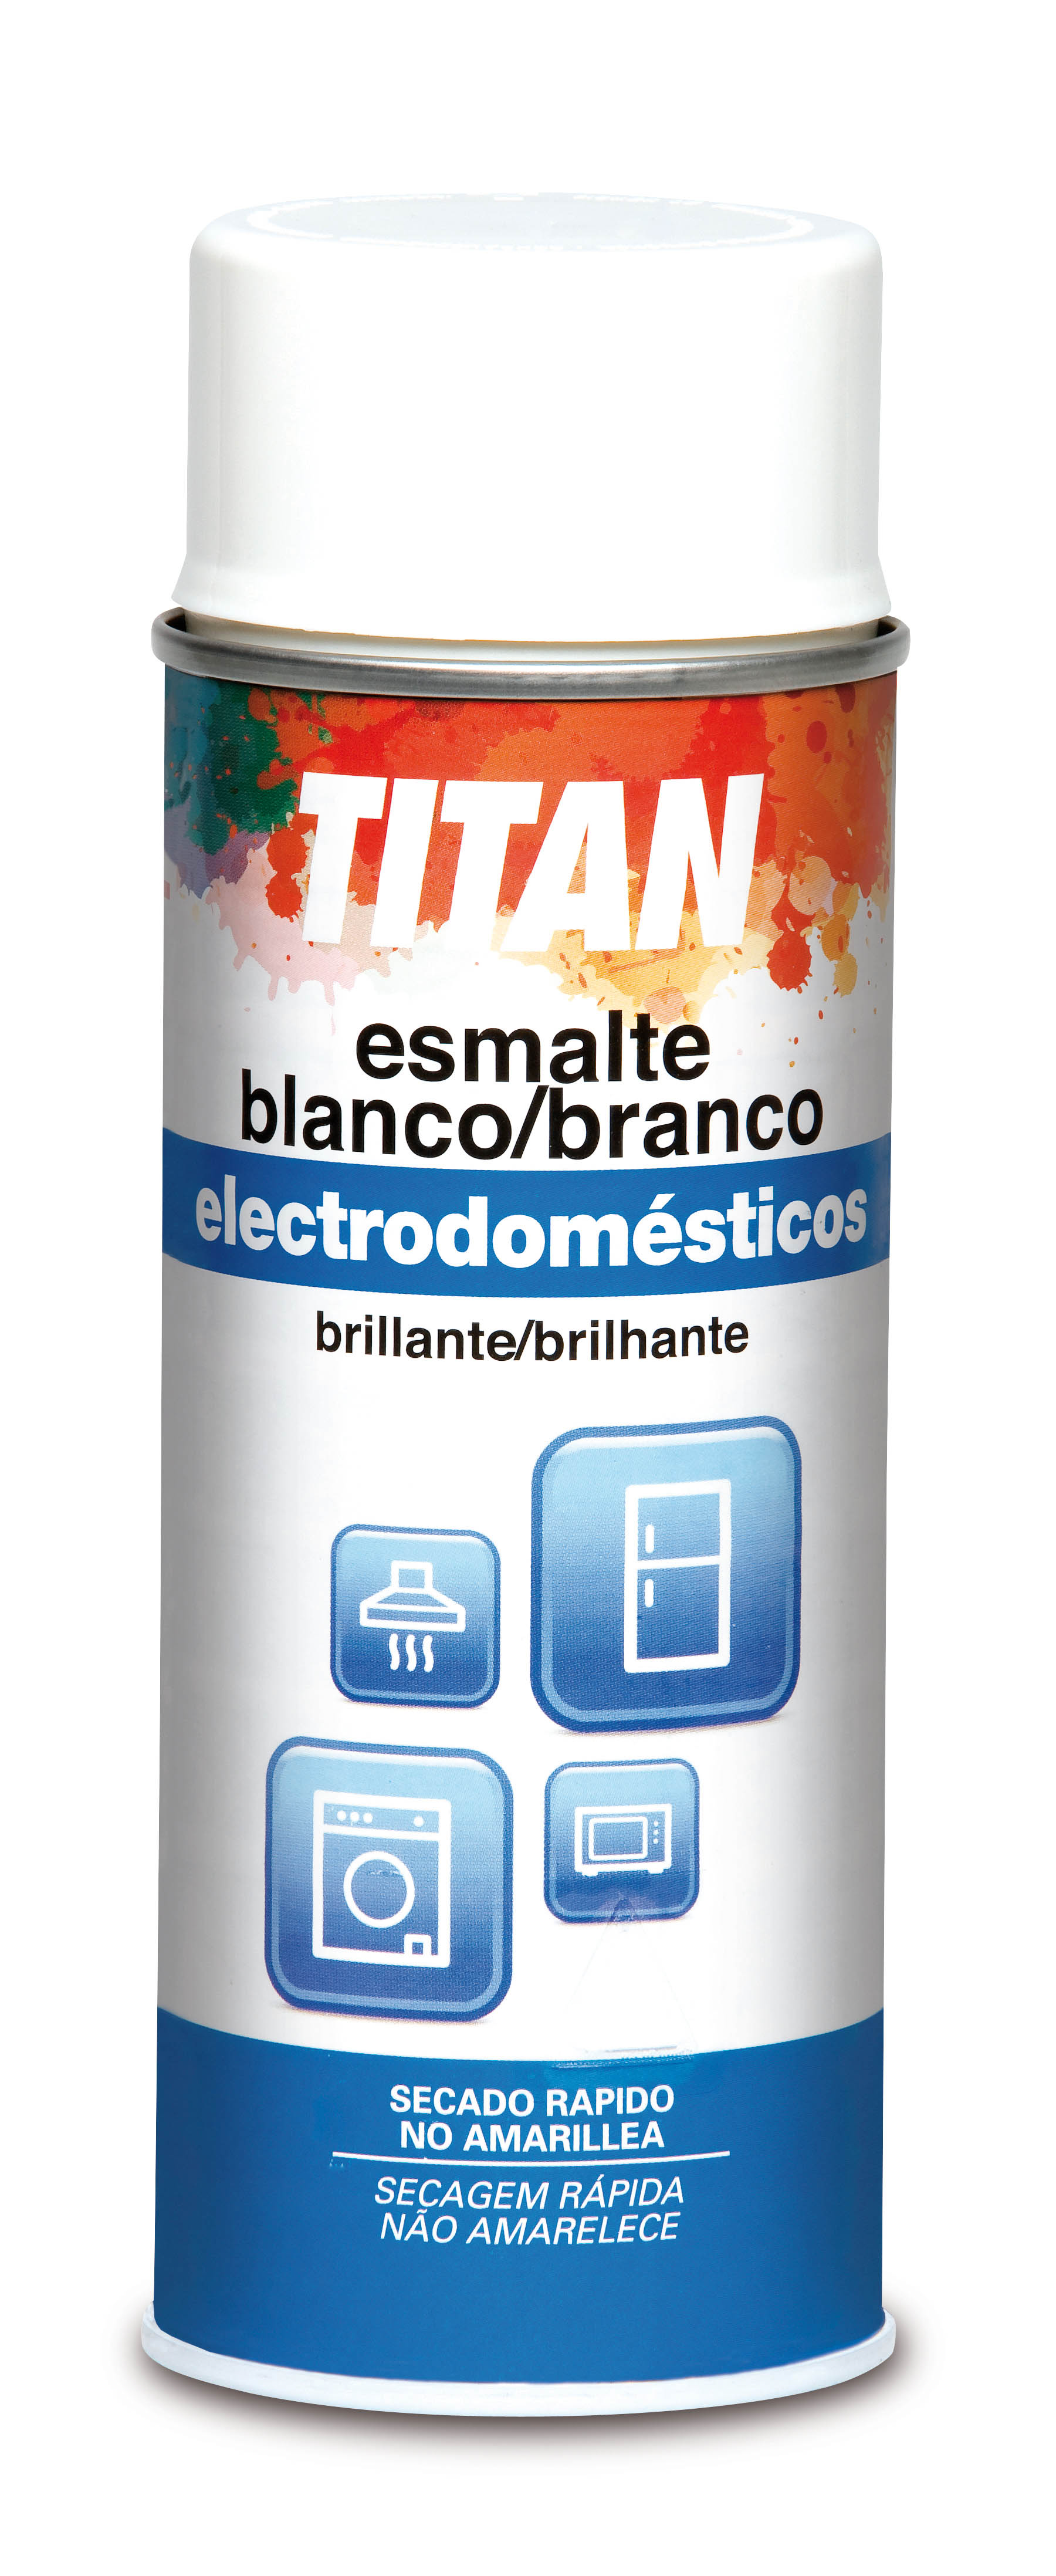 WHITE ENAMEL FOR ELECTRICAL APPLIANCES